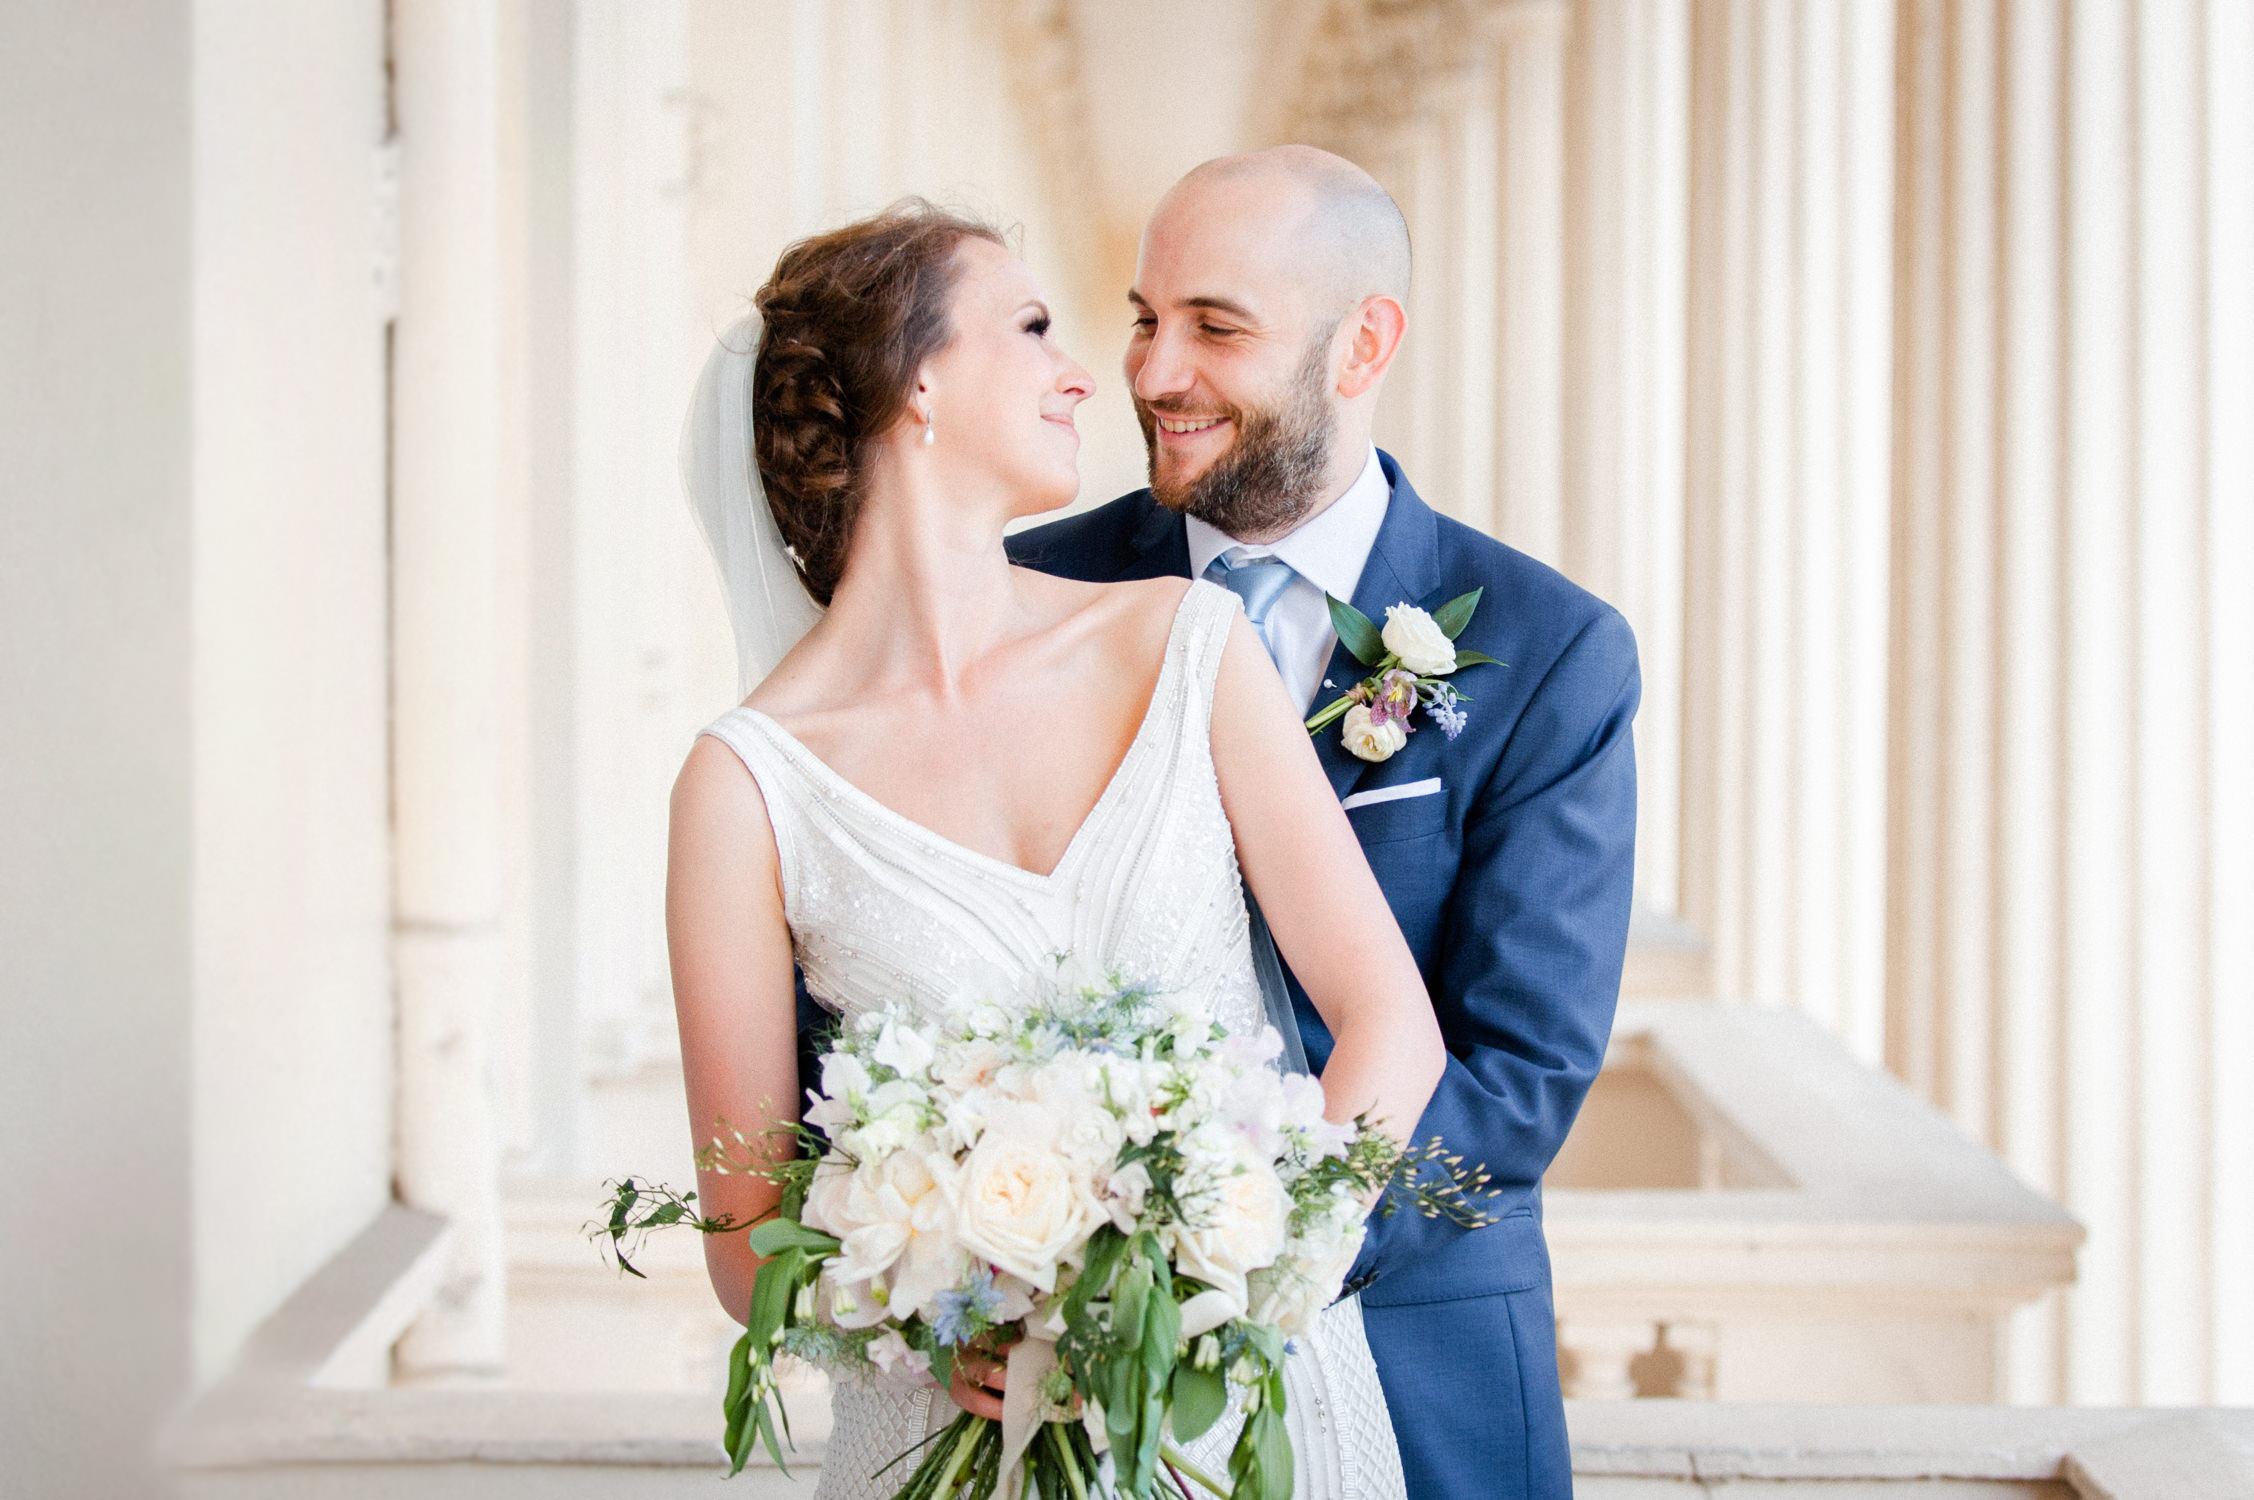 ICA london wedding photographer- Erika Rimkute